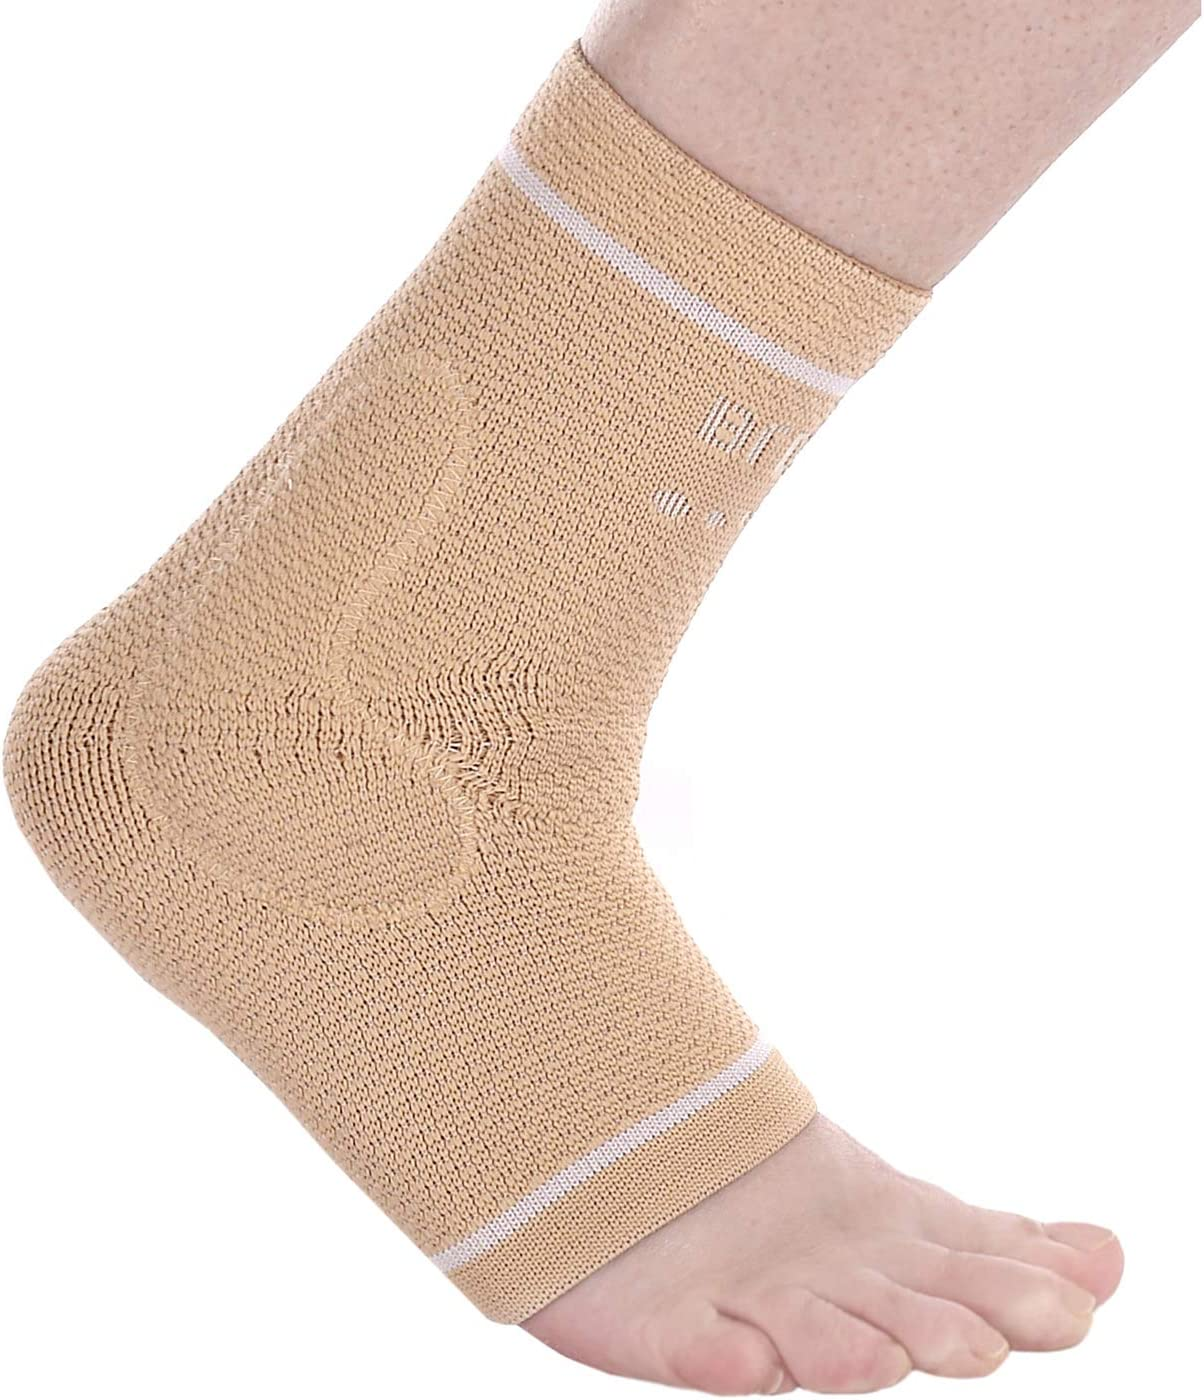 BRD Sport Compression Ankle Brace Offers depot FDA Registered Ta security